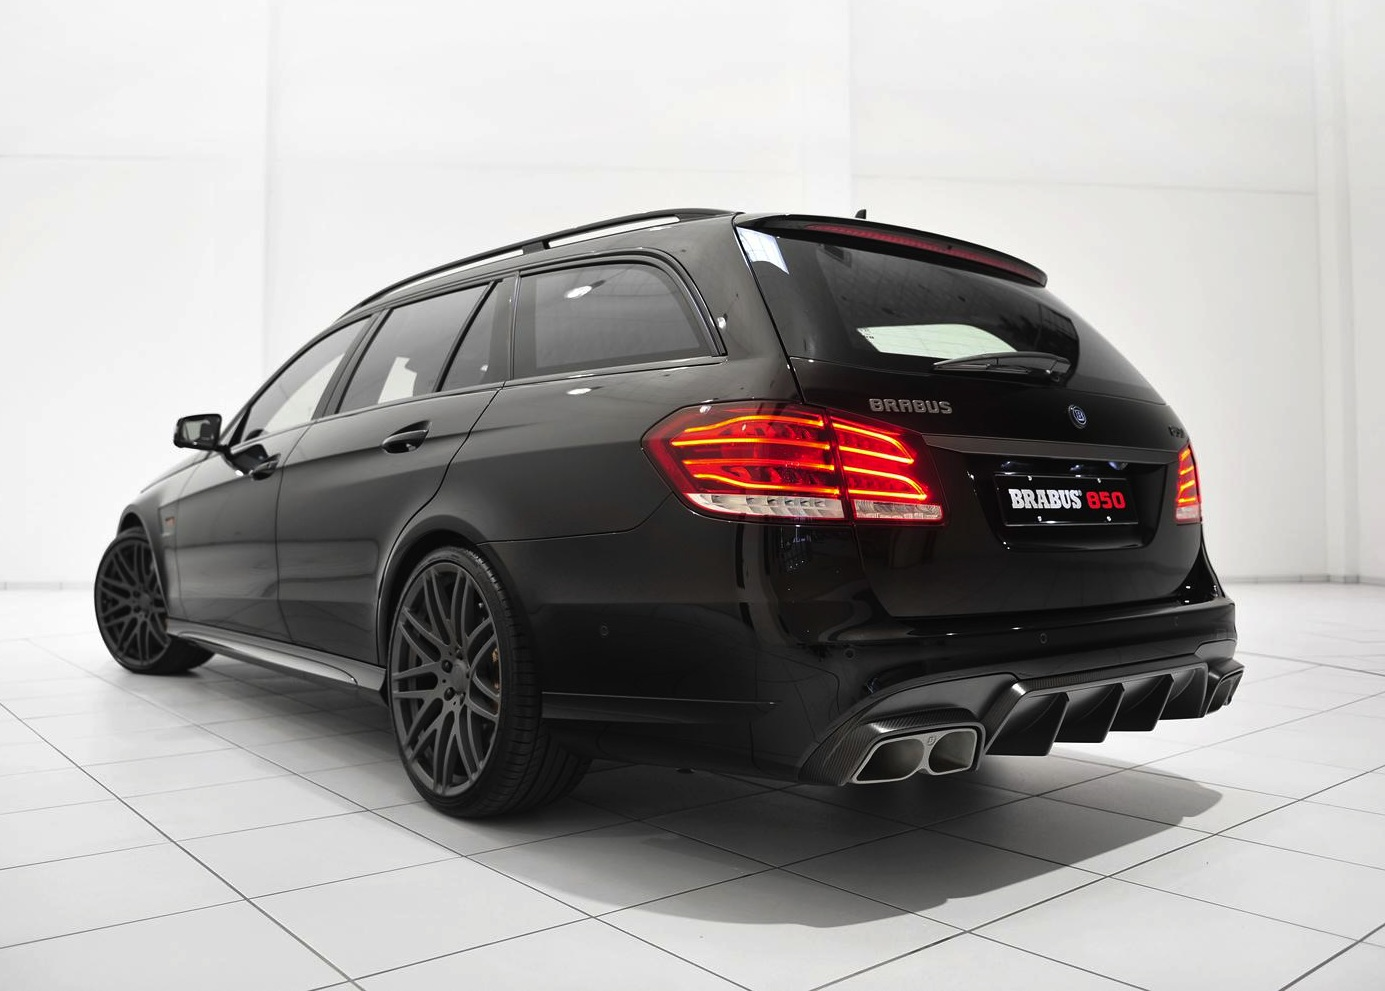 Brabus 850 6 0 biturbo mercedes benz e 63 amg rear for Mercedes benz 850